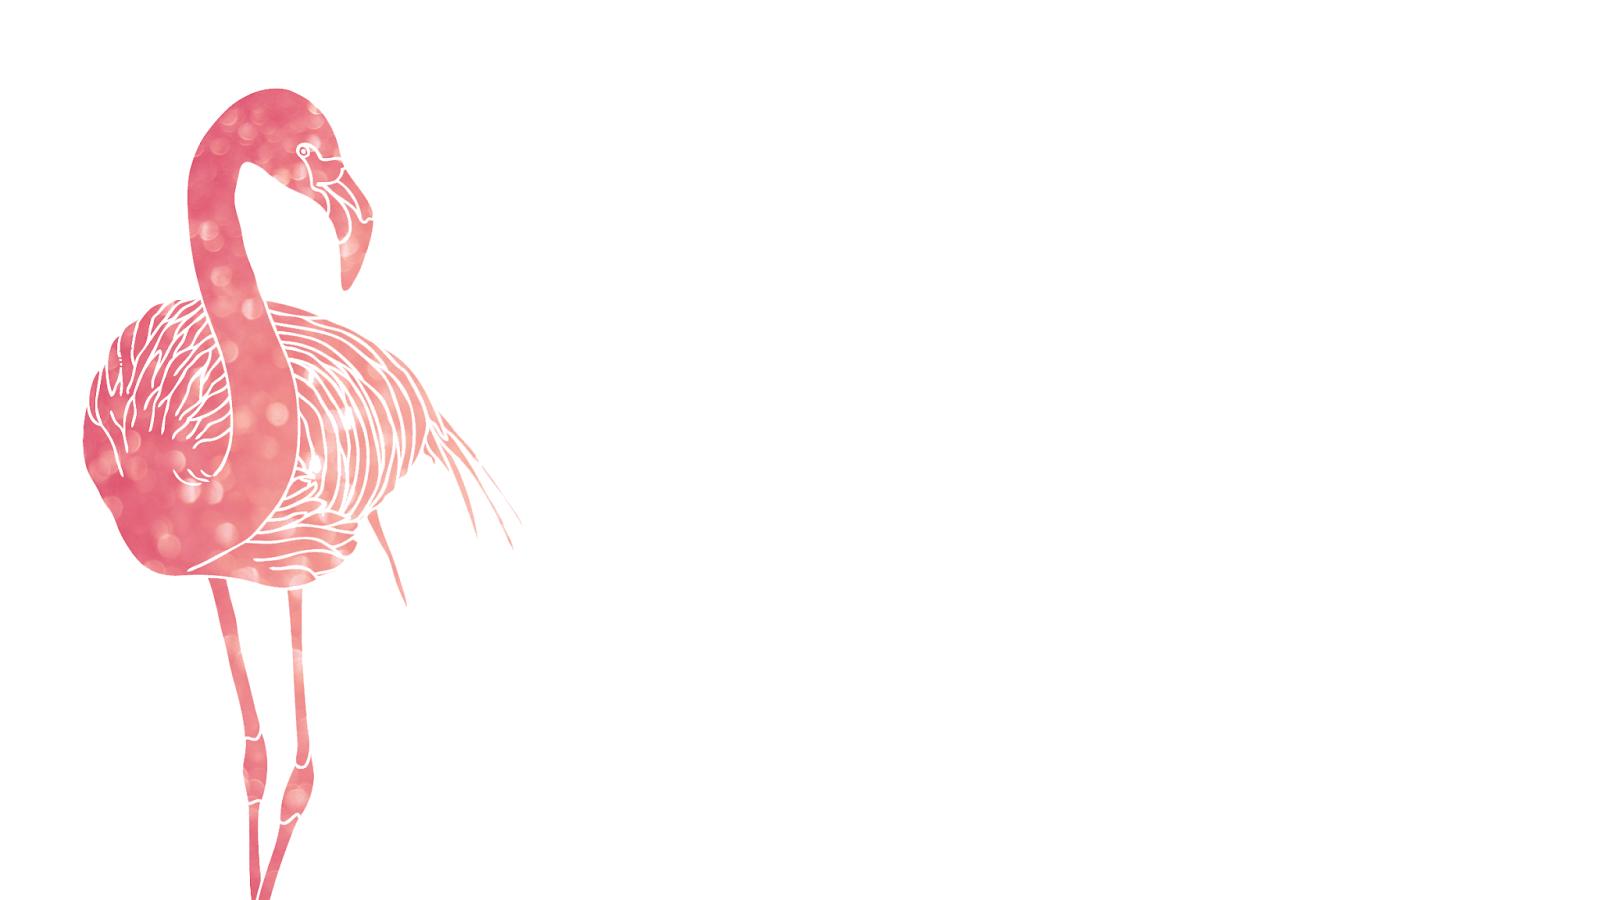 Black Flamingo Desktop Wallpapers Top Free Black Flamingo Desktop Backgrounds Wallpaperaccess